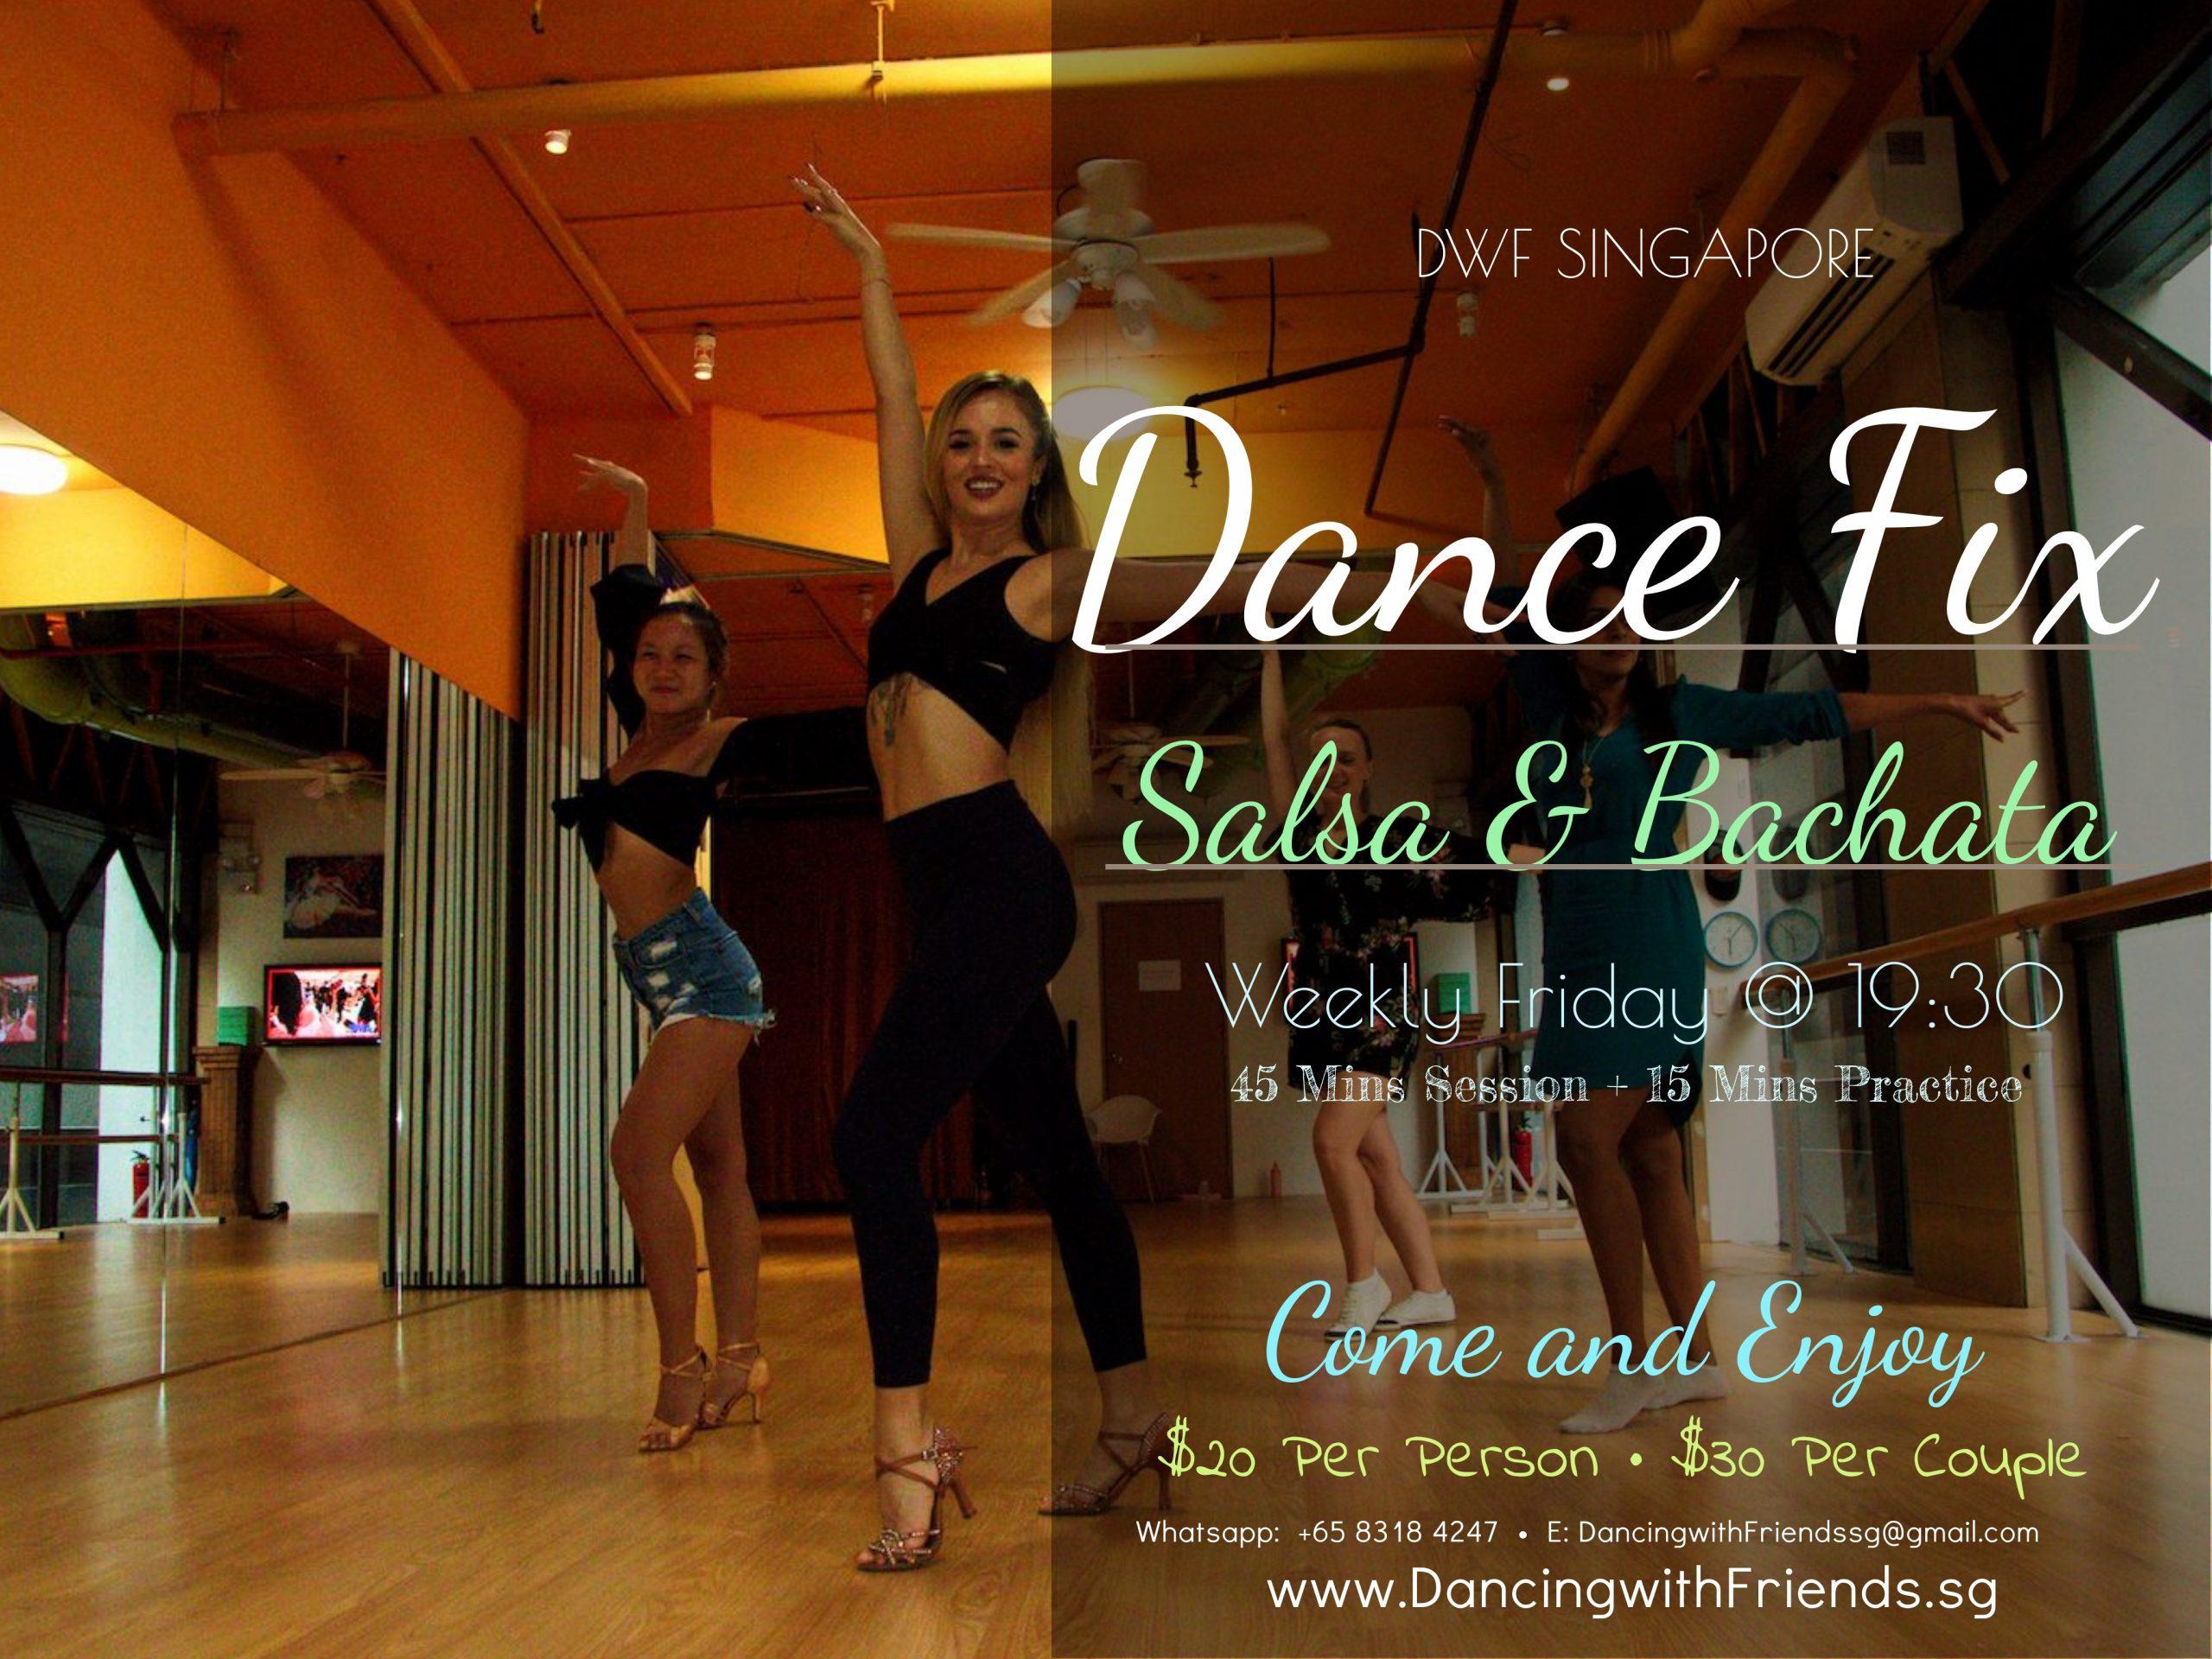 http://dancingwithfriends.sg/wp-content/uploads/2020/02/Dance-Fix-02-scaled.jpg